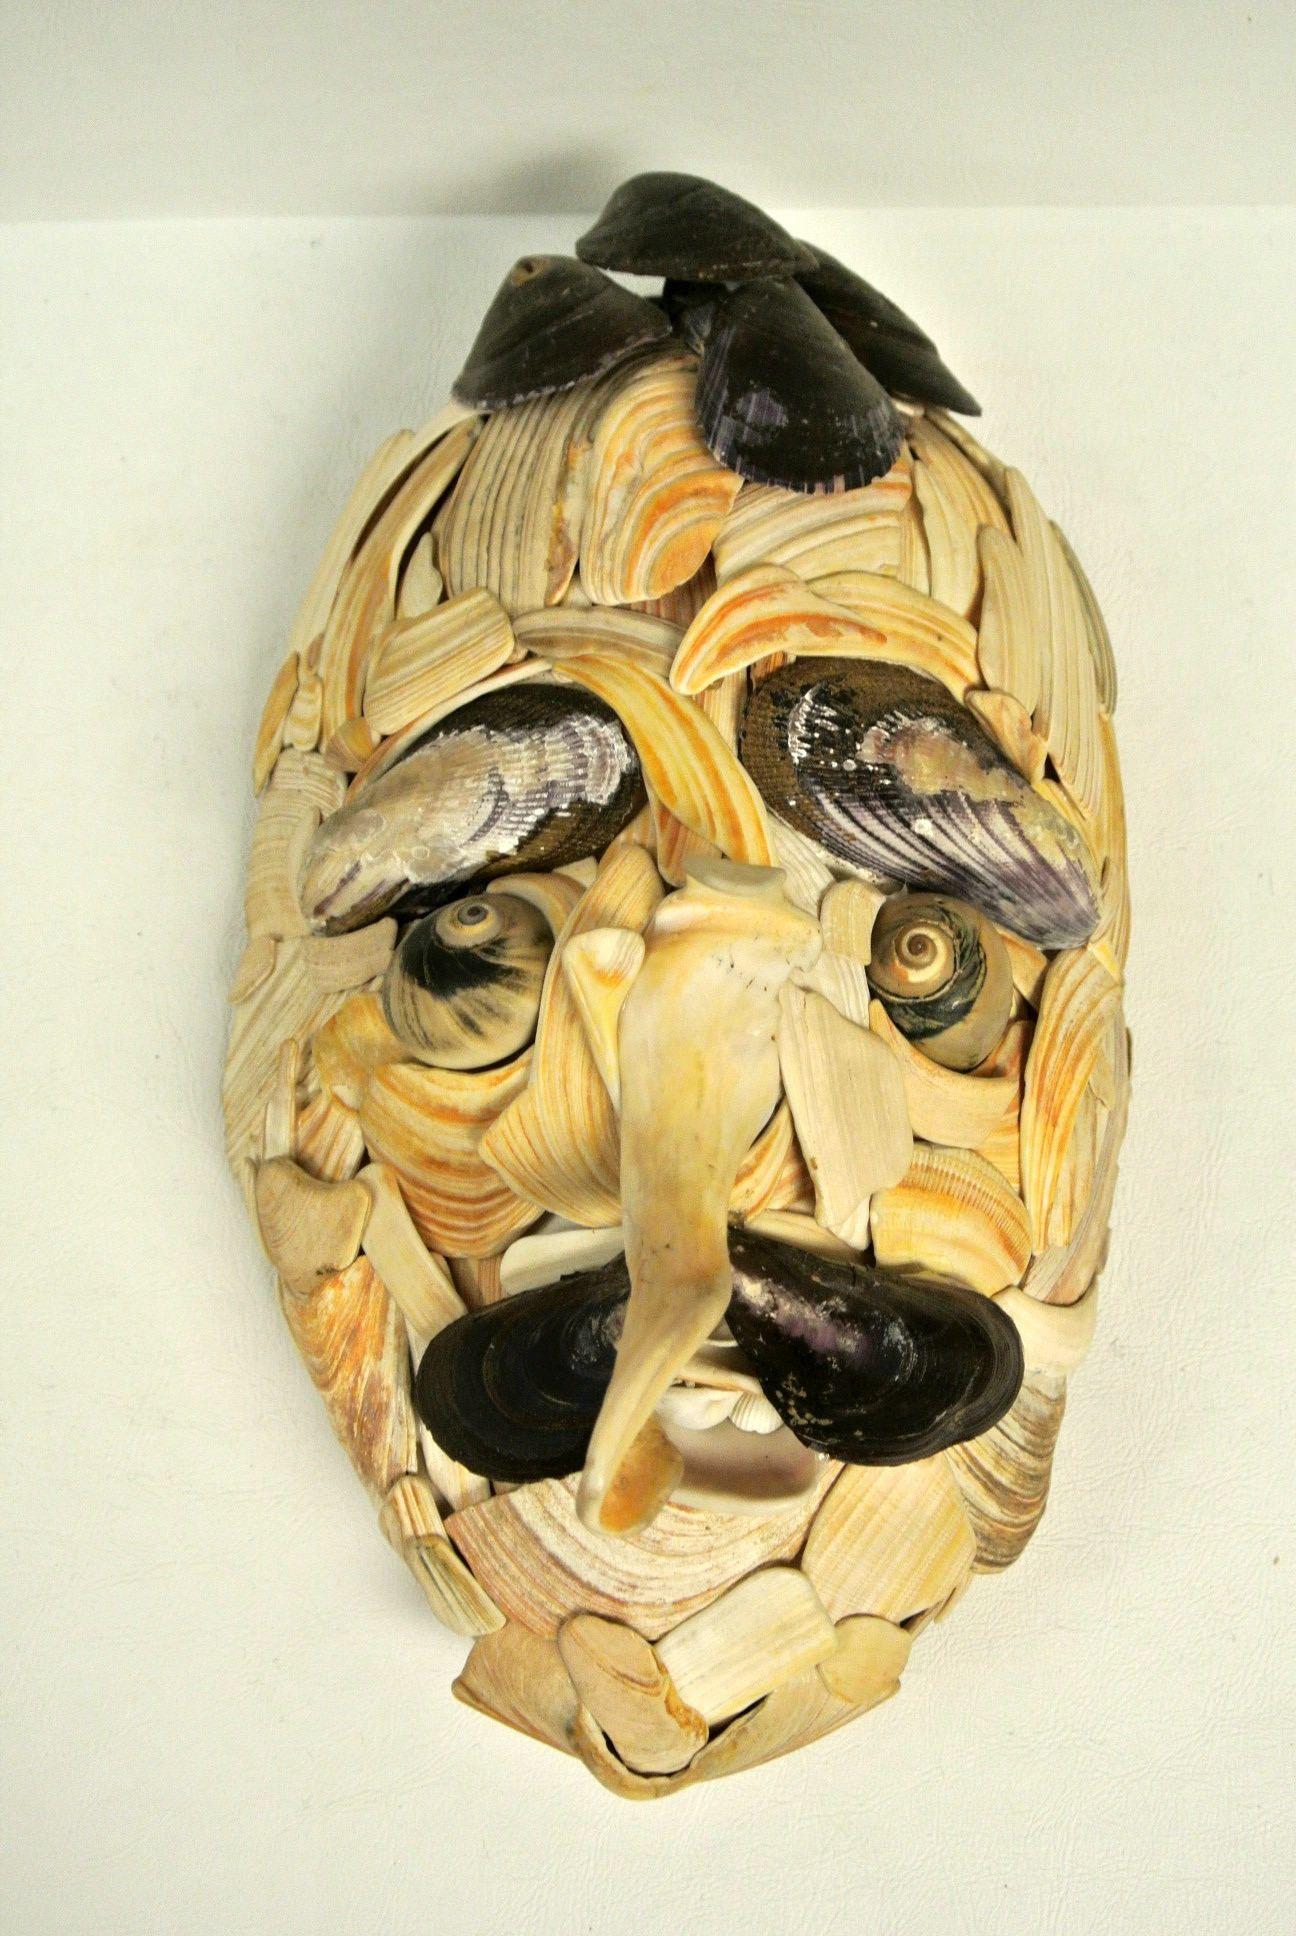 Vintage 1960s Handmade Seashell Face Wall Art Shell Sculpture Mask ...